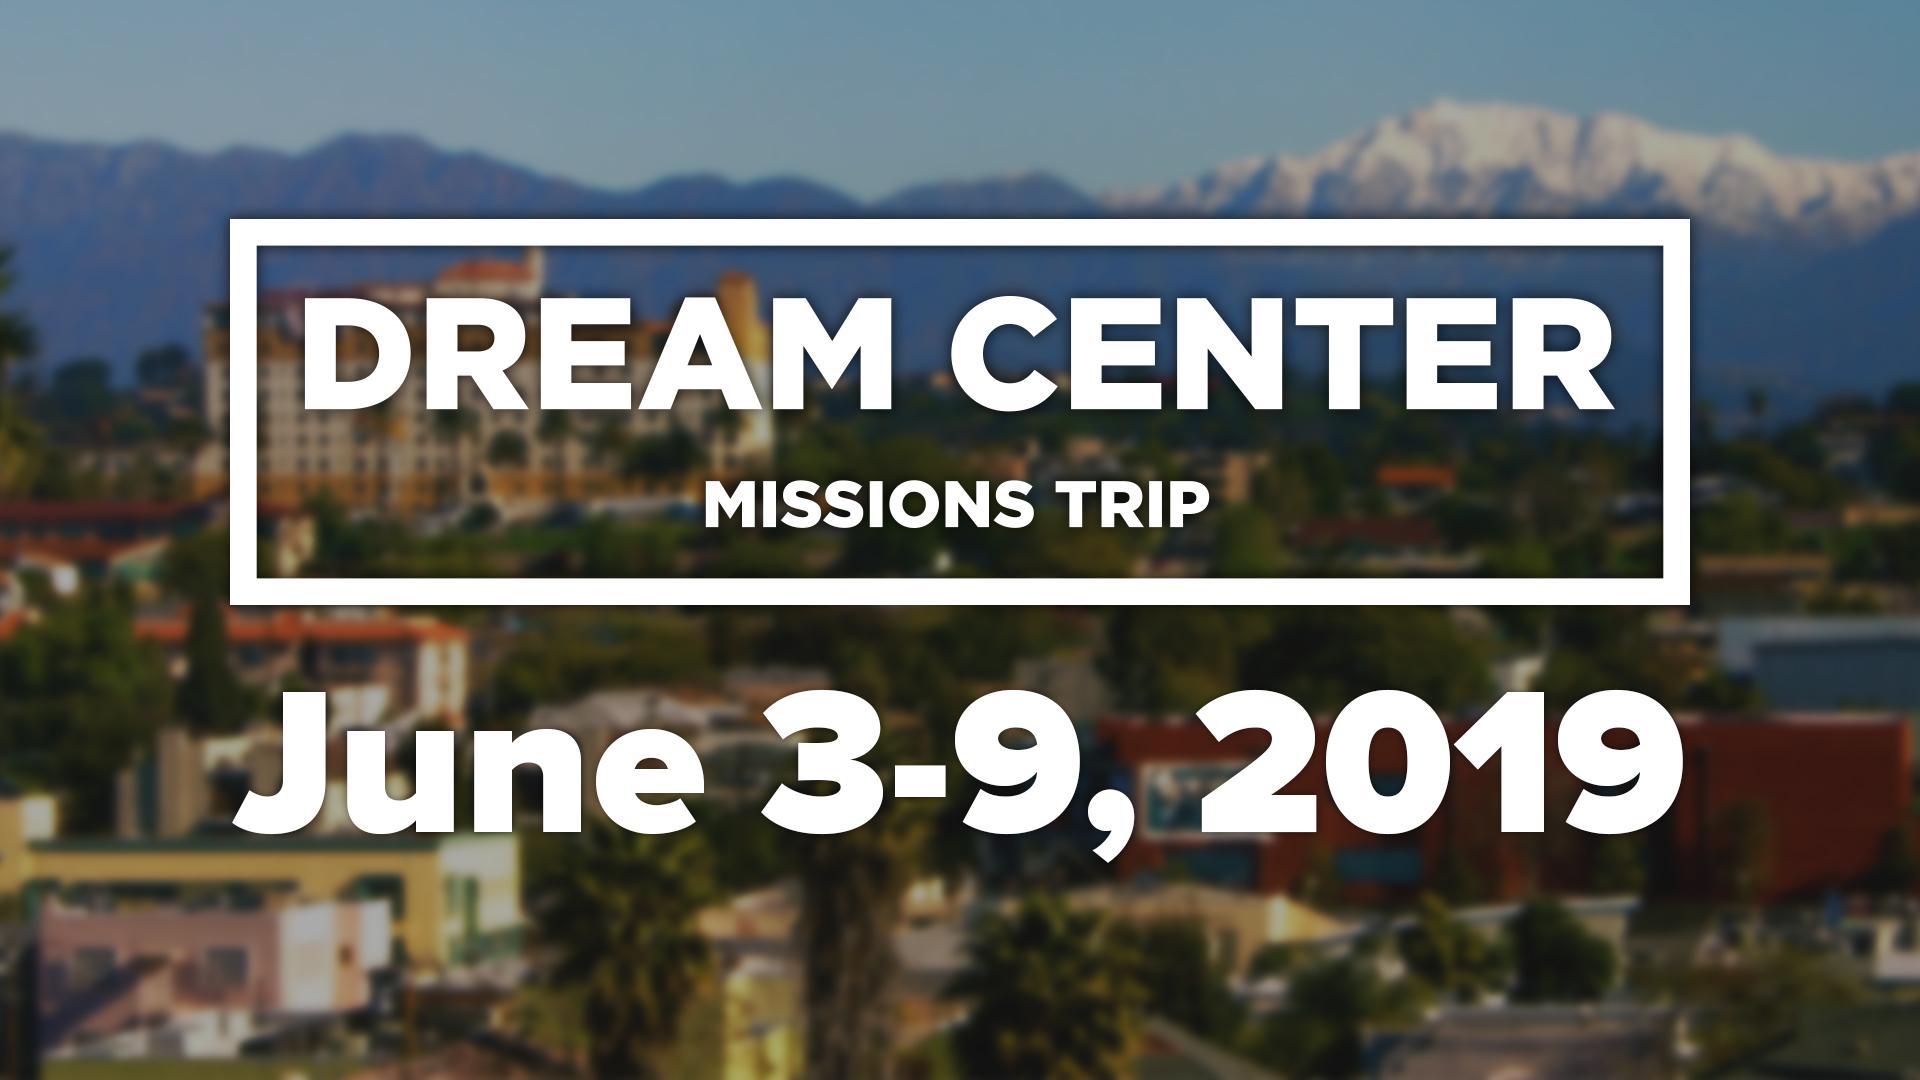 Dream Center Missions Trip_2019.jpg